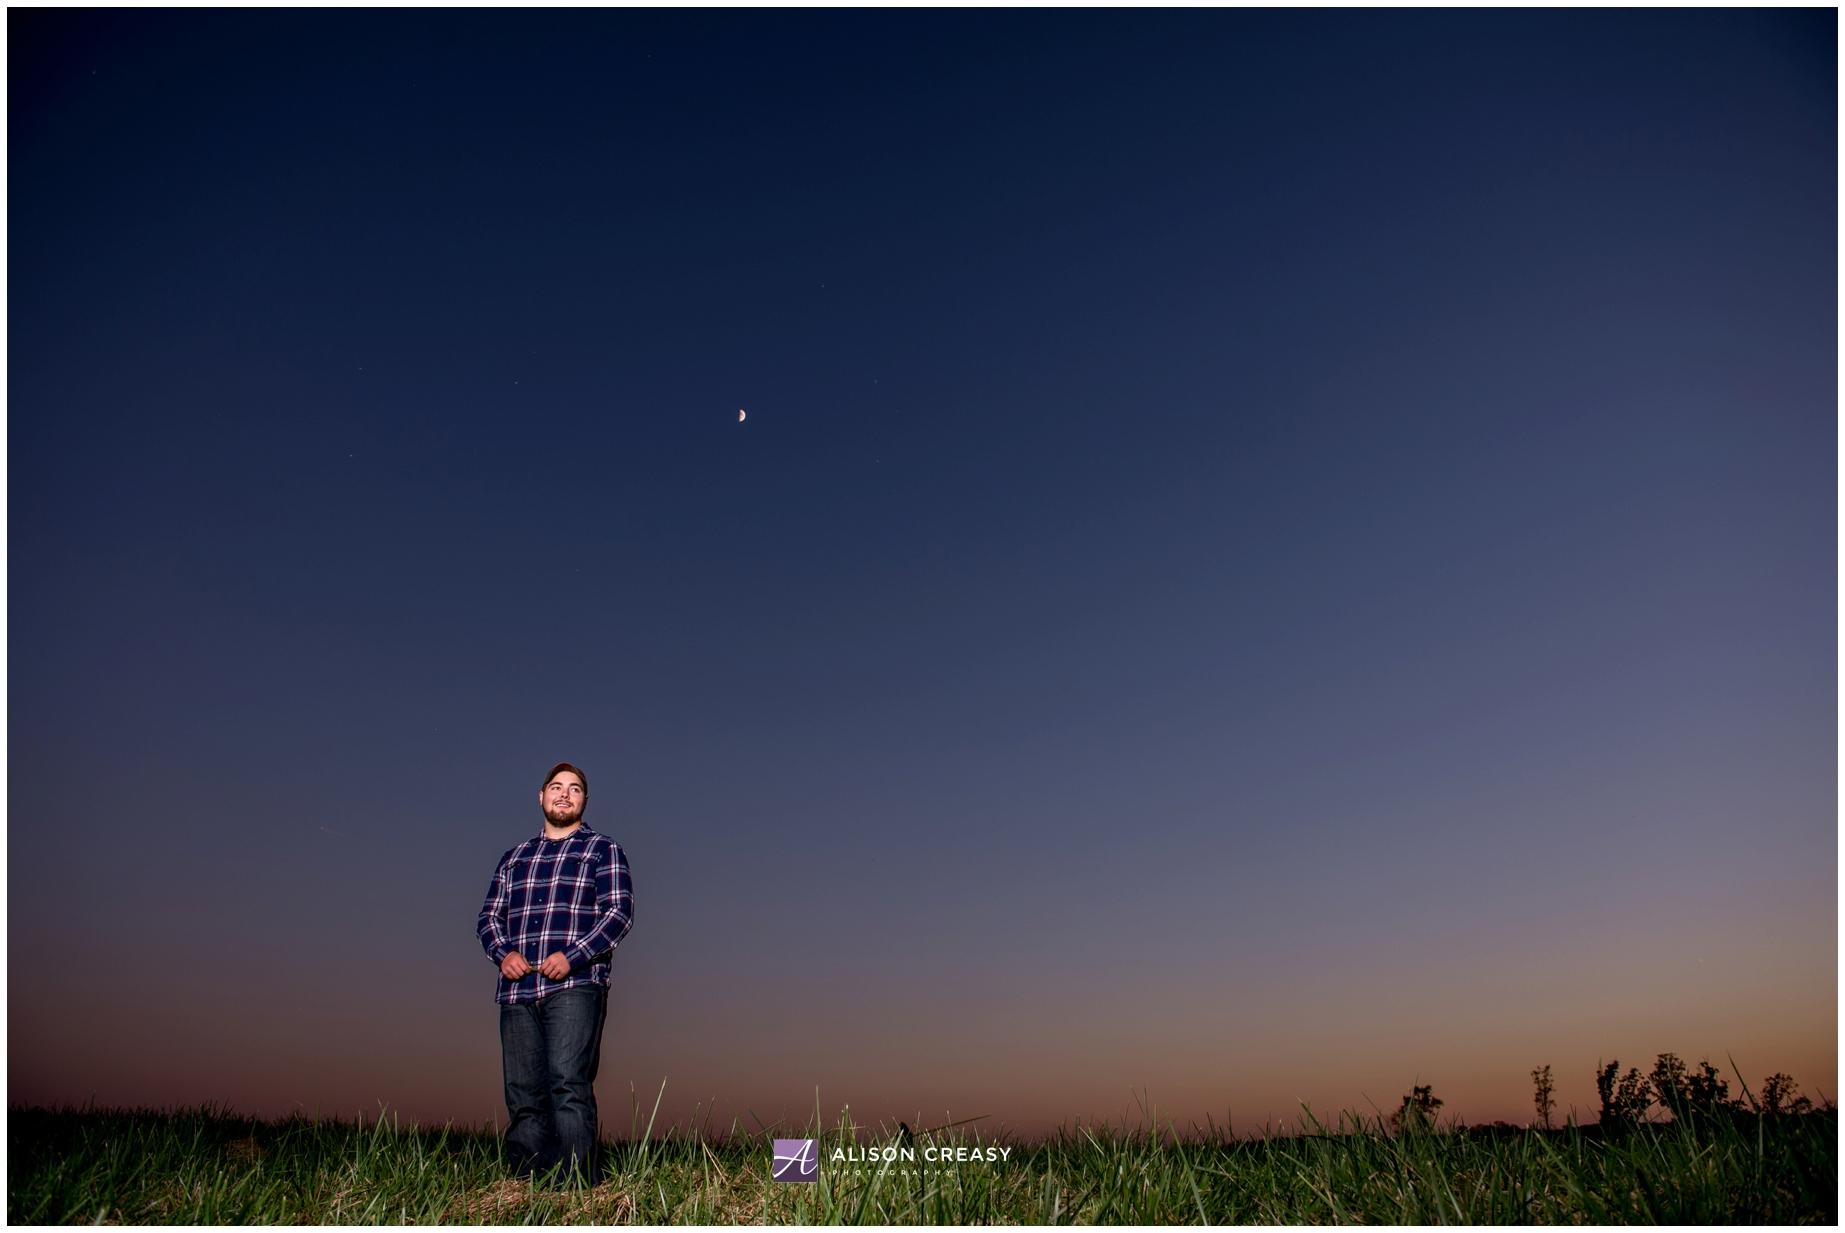 Alison-Creasy-Photography-Lynchburg-VA-Photographer_1013.jpg